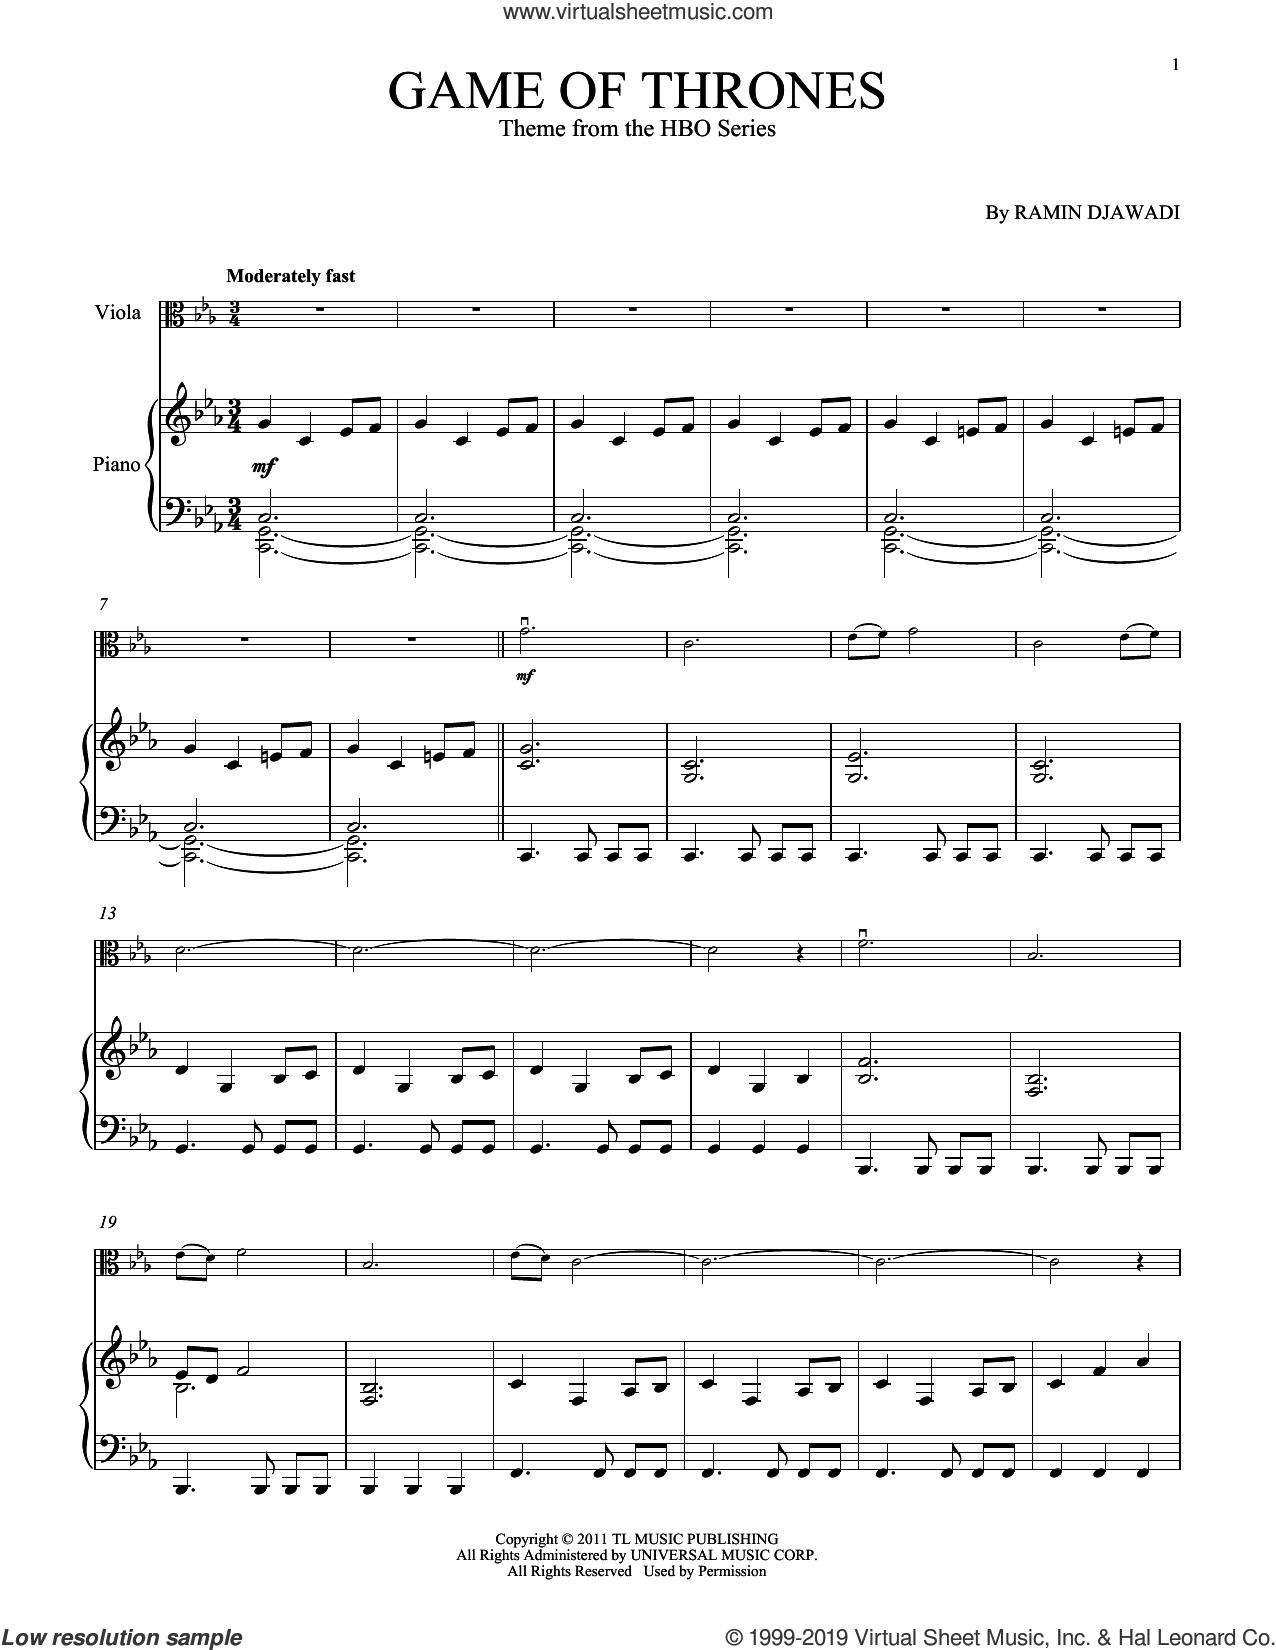 Game Of Thrones sheet music for viola and piano by Ramin Djawadi, intermediate skill level